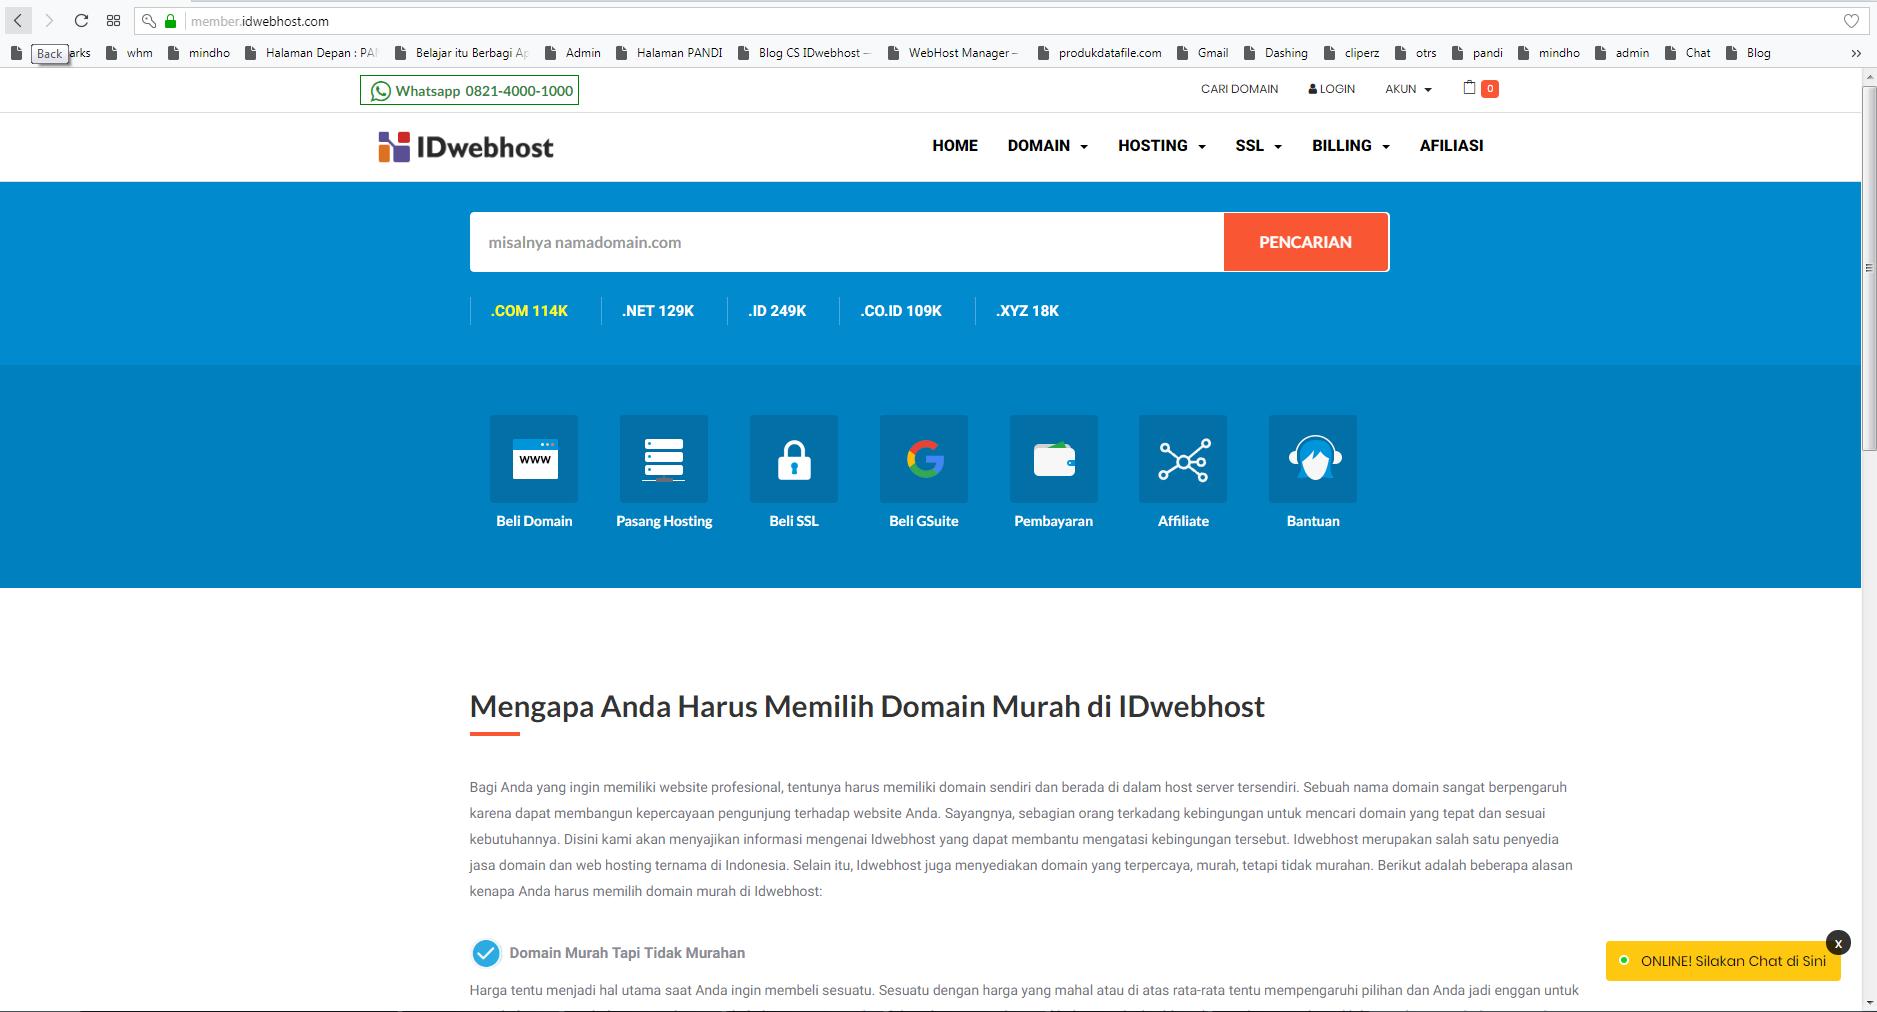 Order Transfer Domain di Halaman Member Idwebhost.com